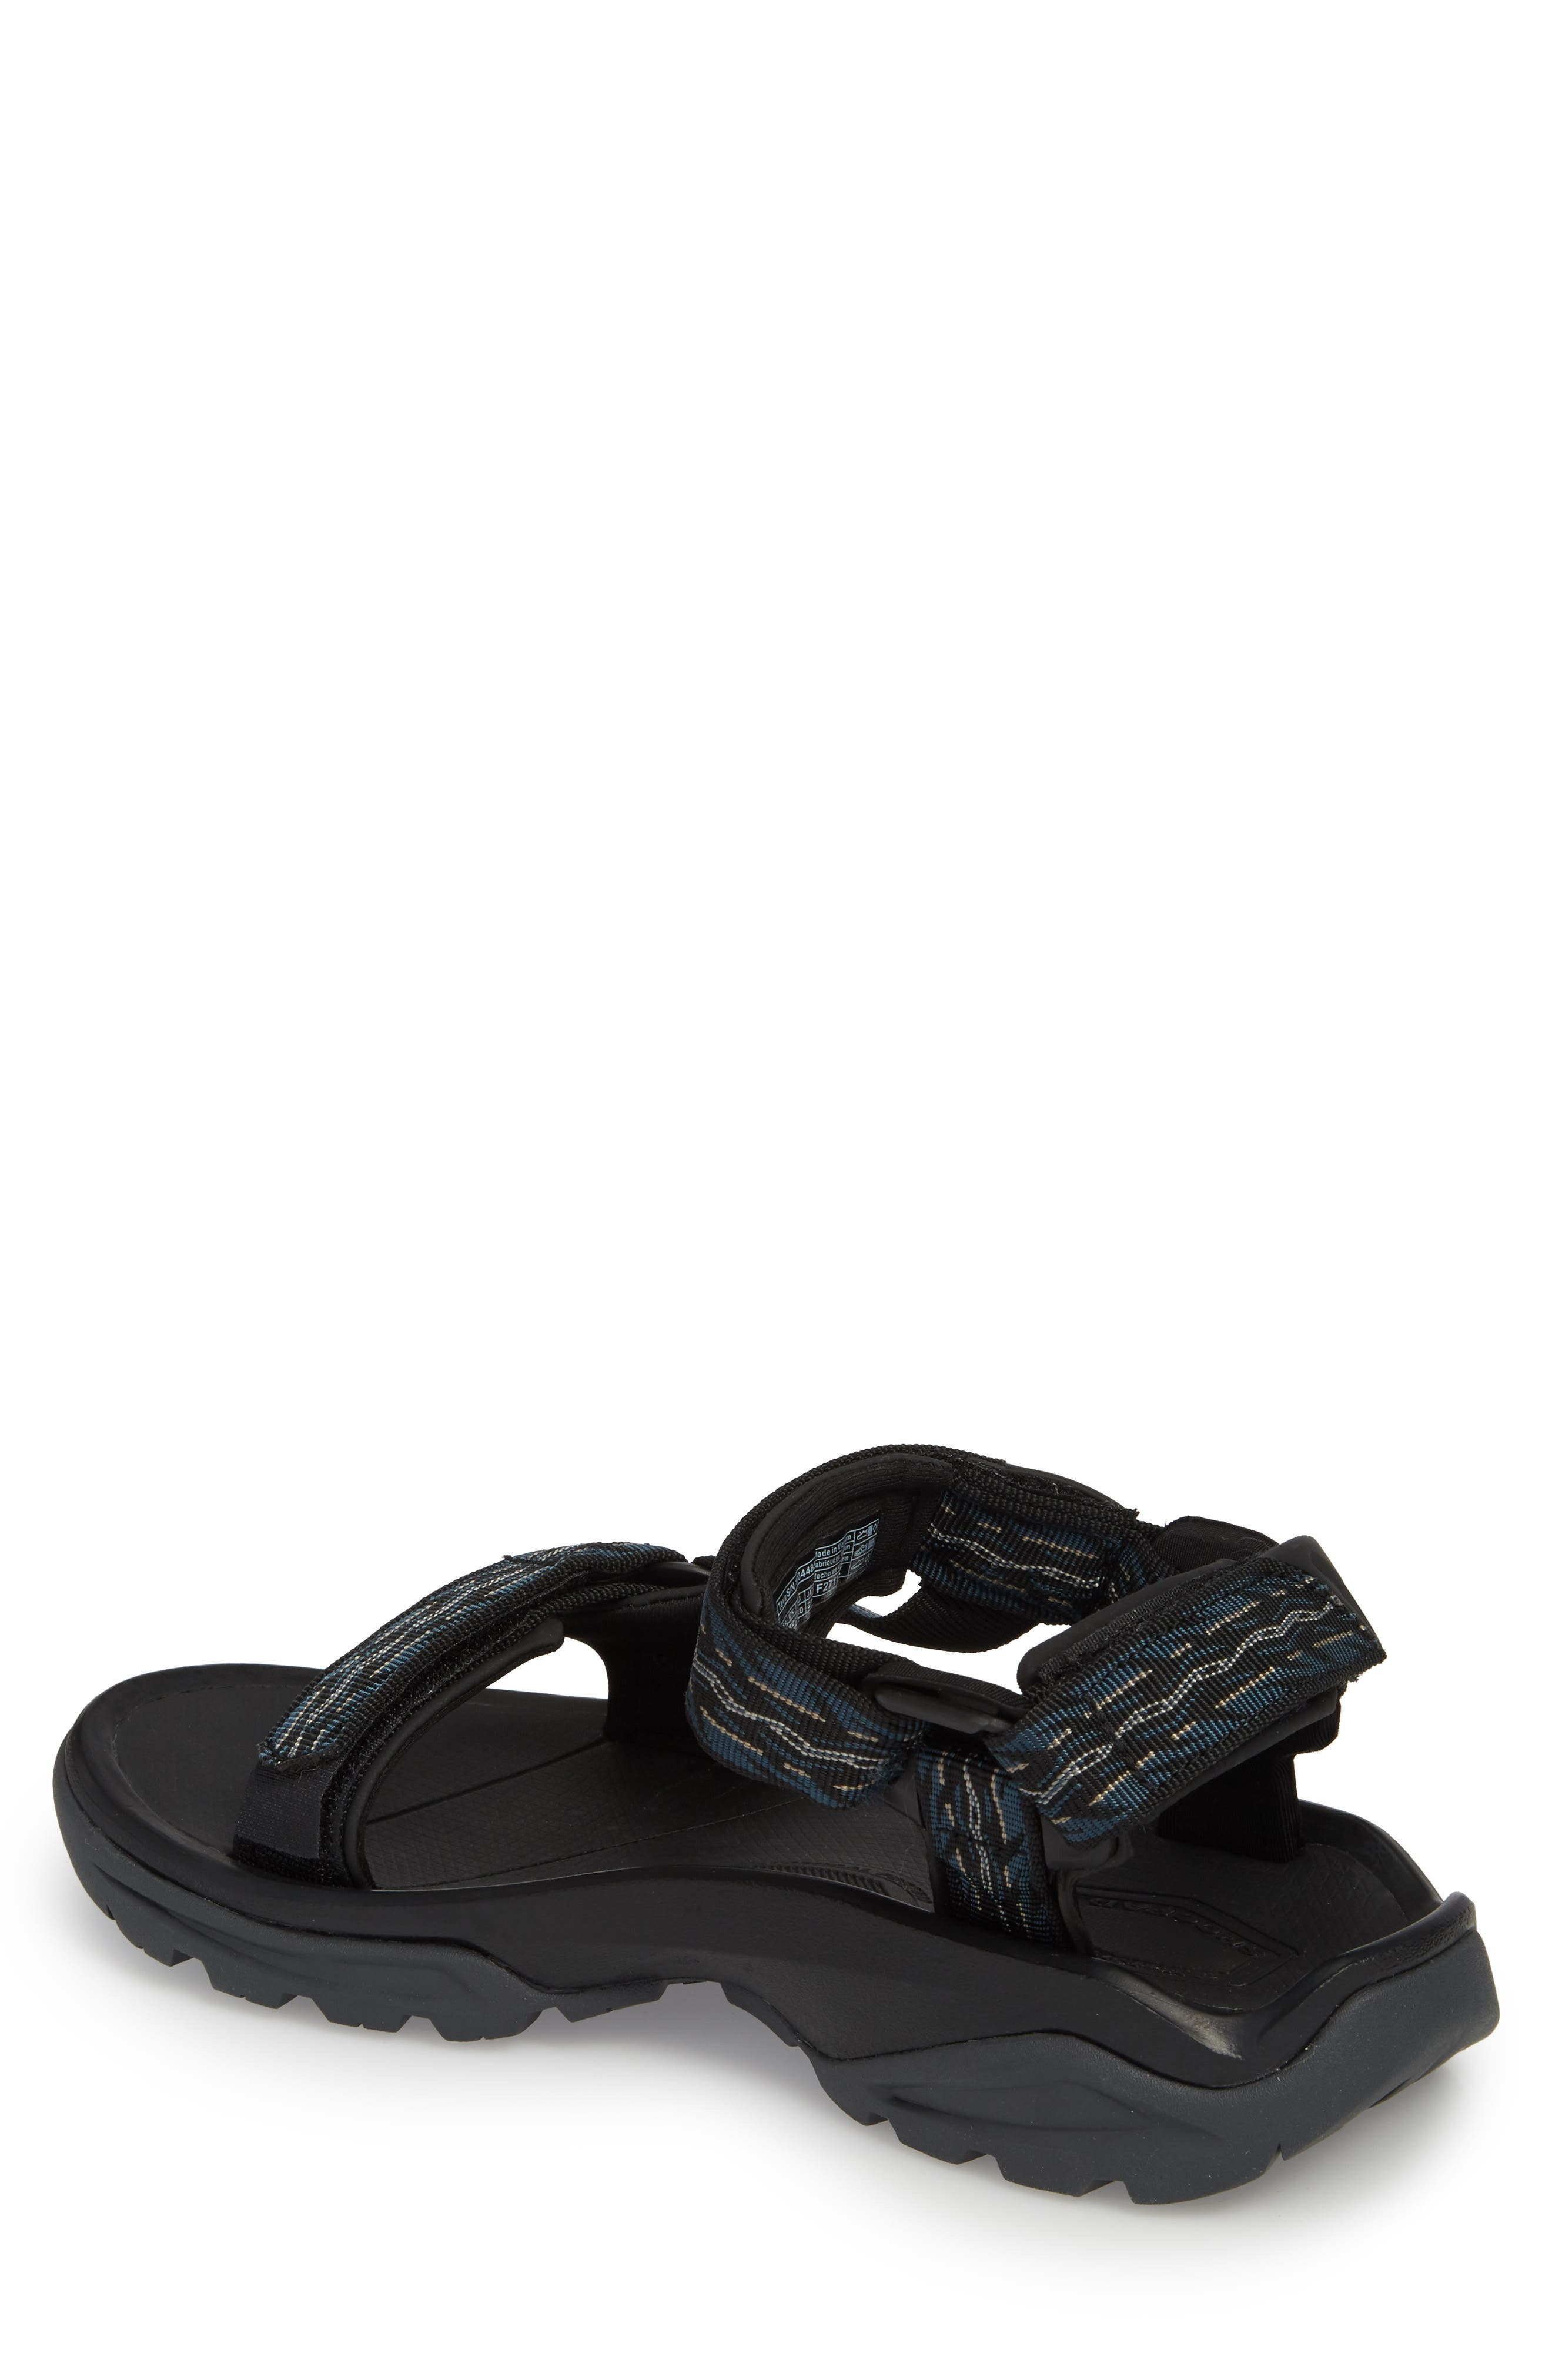 TEVA, Terra Fi 4 Sport Sandal, Alternate thumbnail 2, color, MIDNIGHT BLUE NYLON